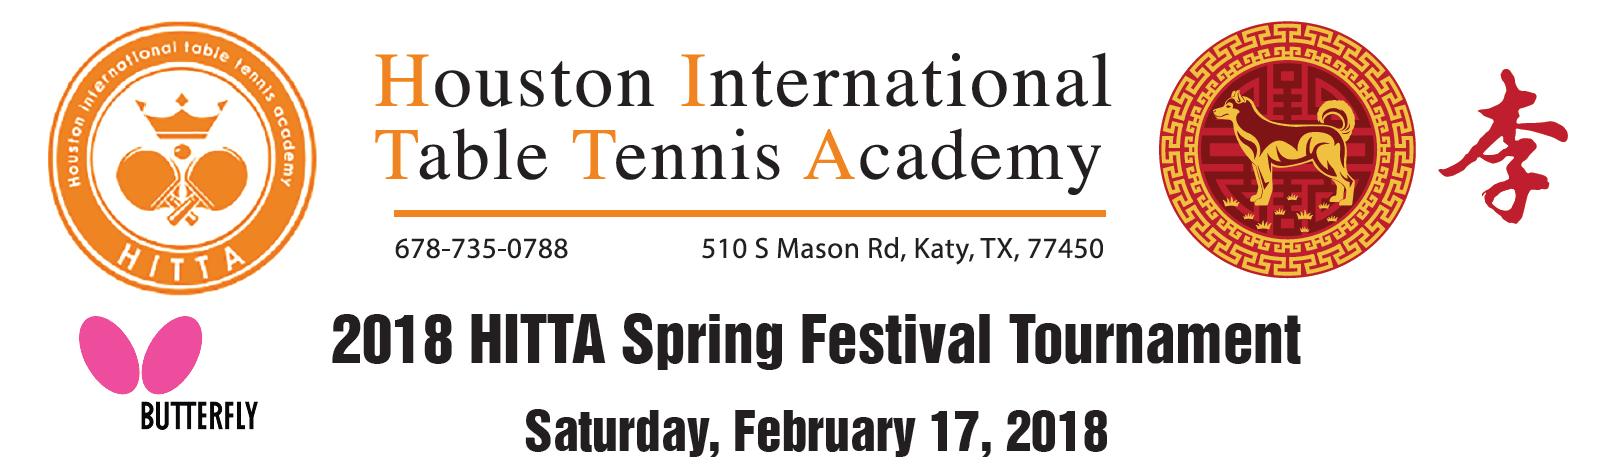 2018 HITTA Spring Festival Tournament